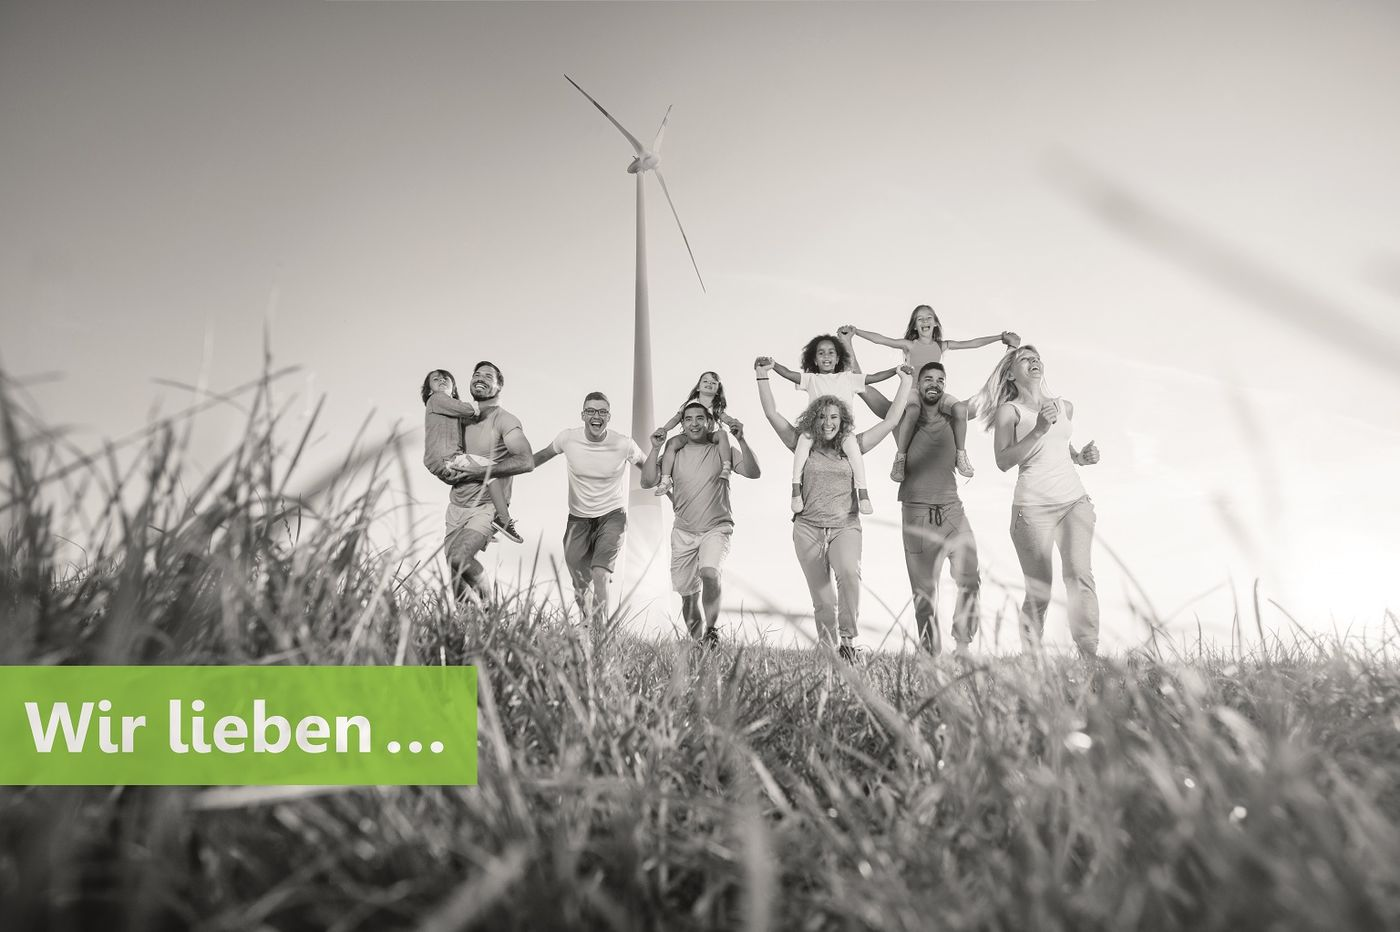 Studentische Aushilfskraft Solar (m/w/d) - Job Bad Bentheim - Post offer form